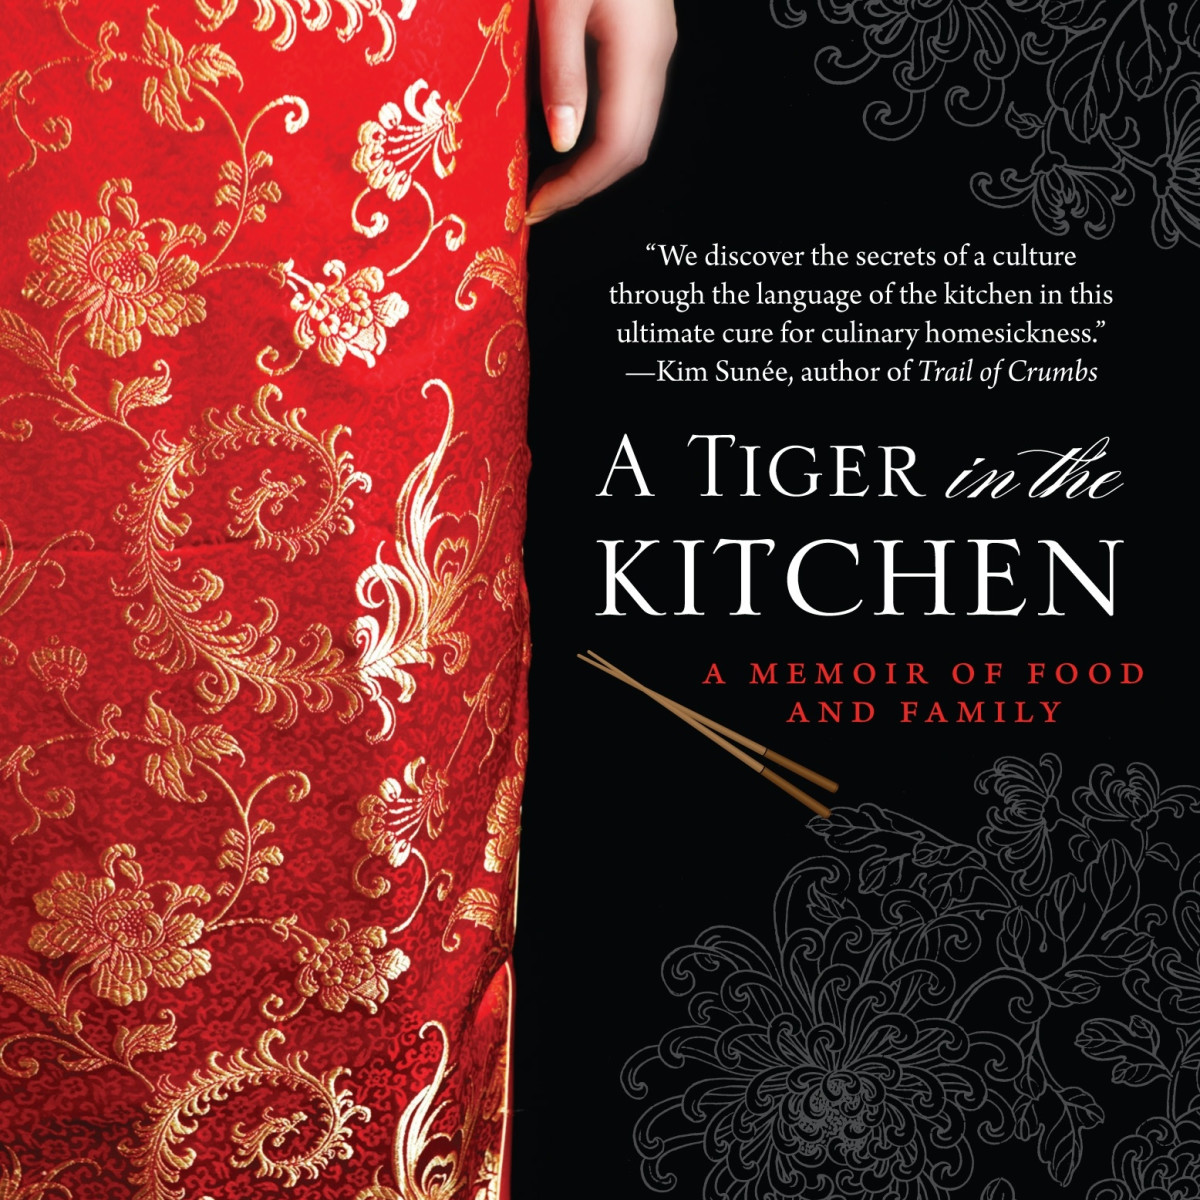 News_TIger in the Kitchen_Cheryl Lu-Lien Tan_June 2011